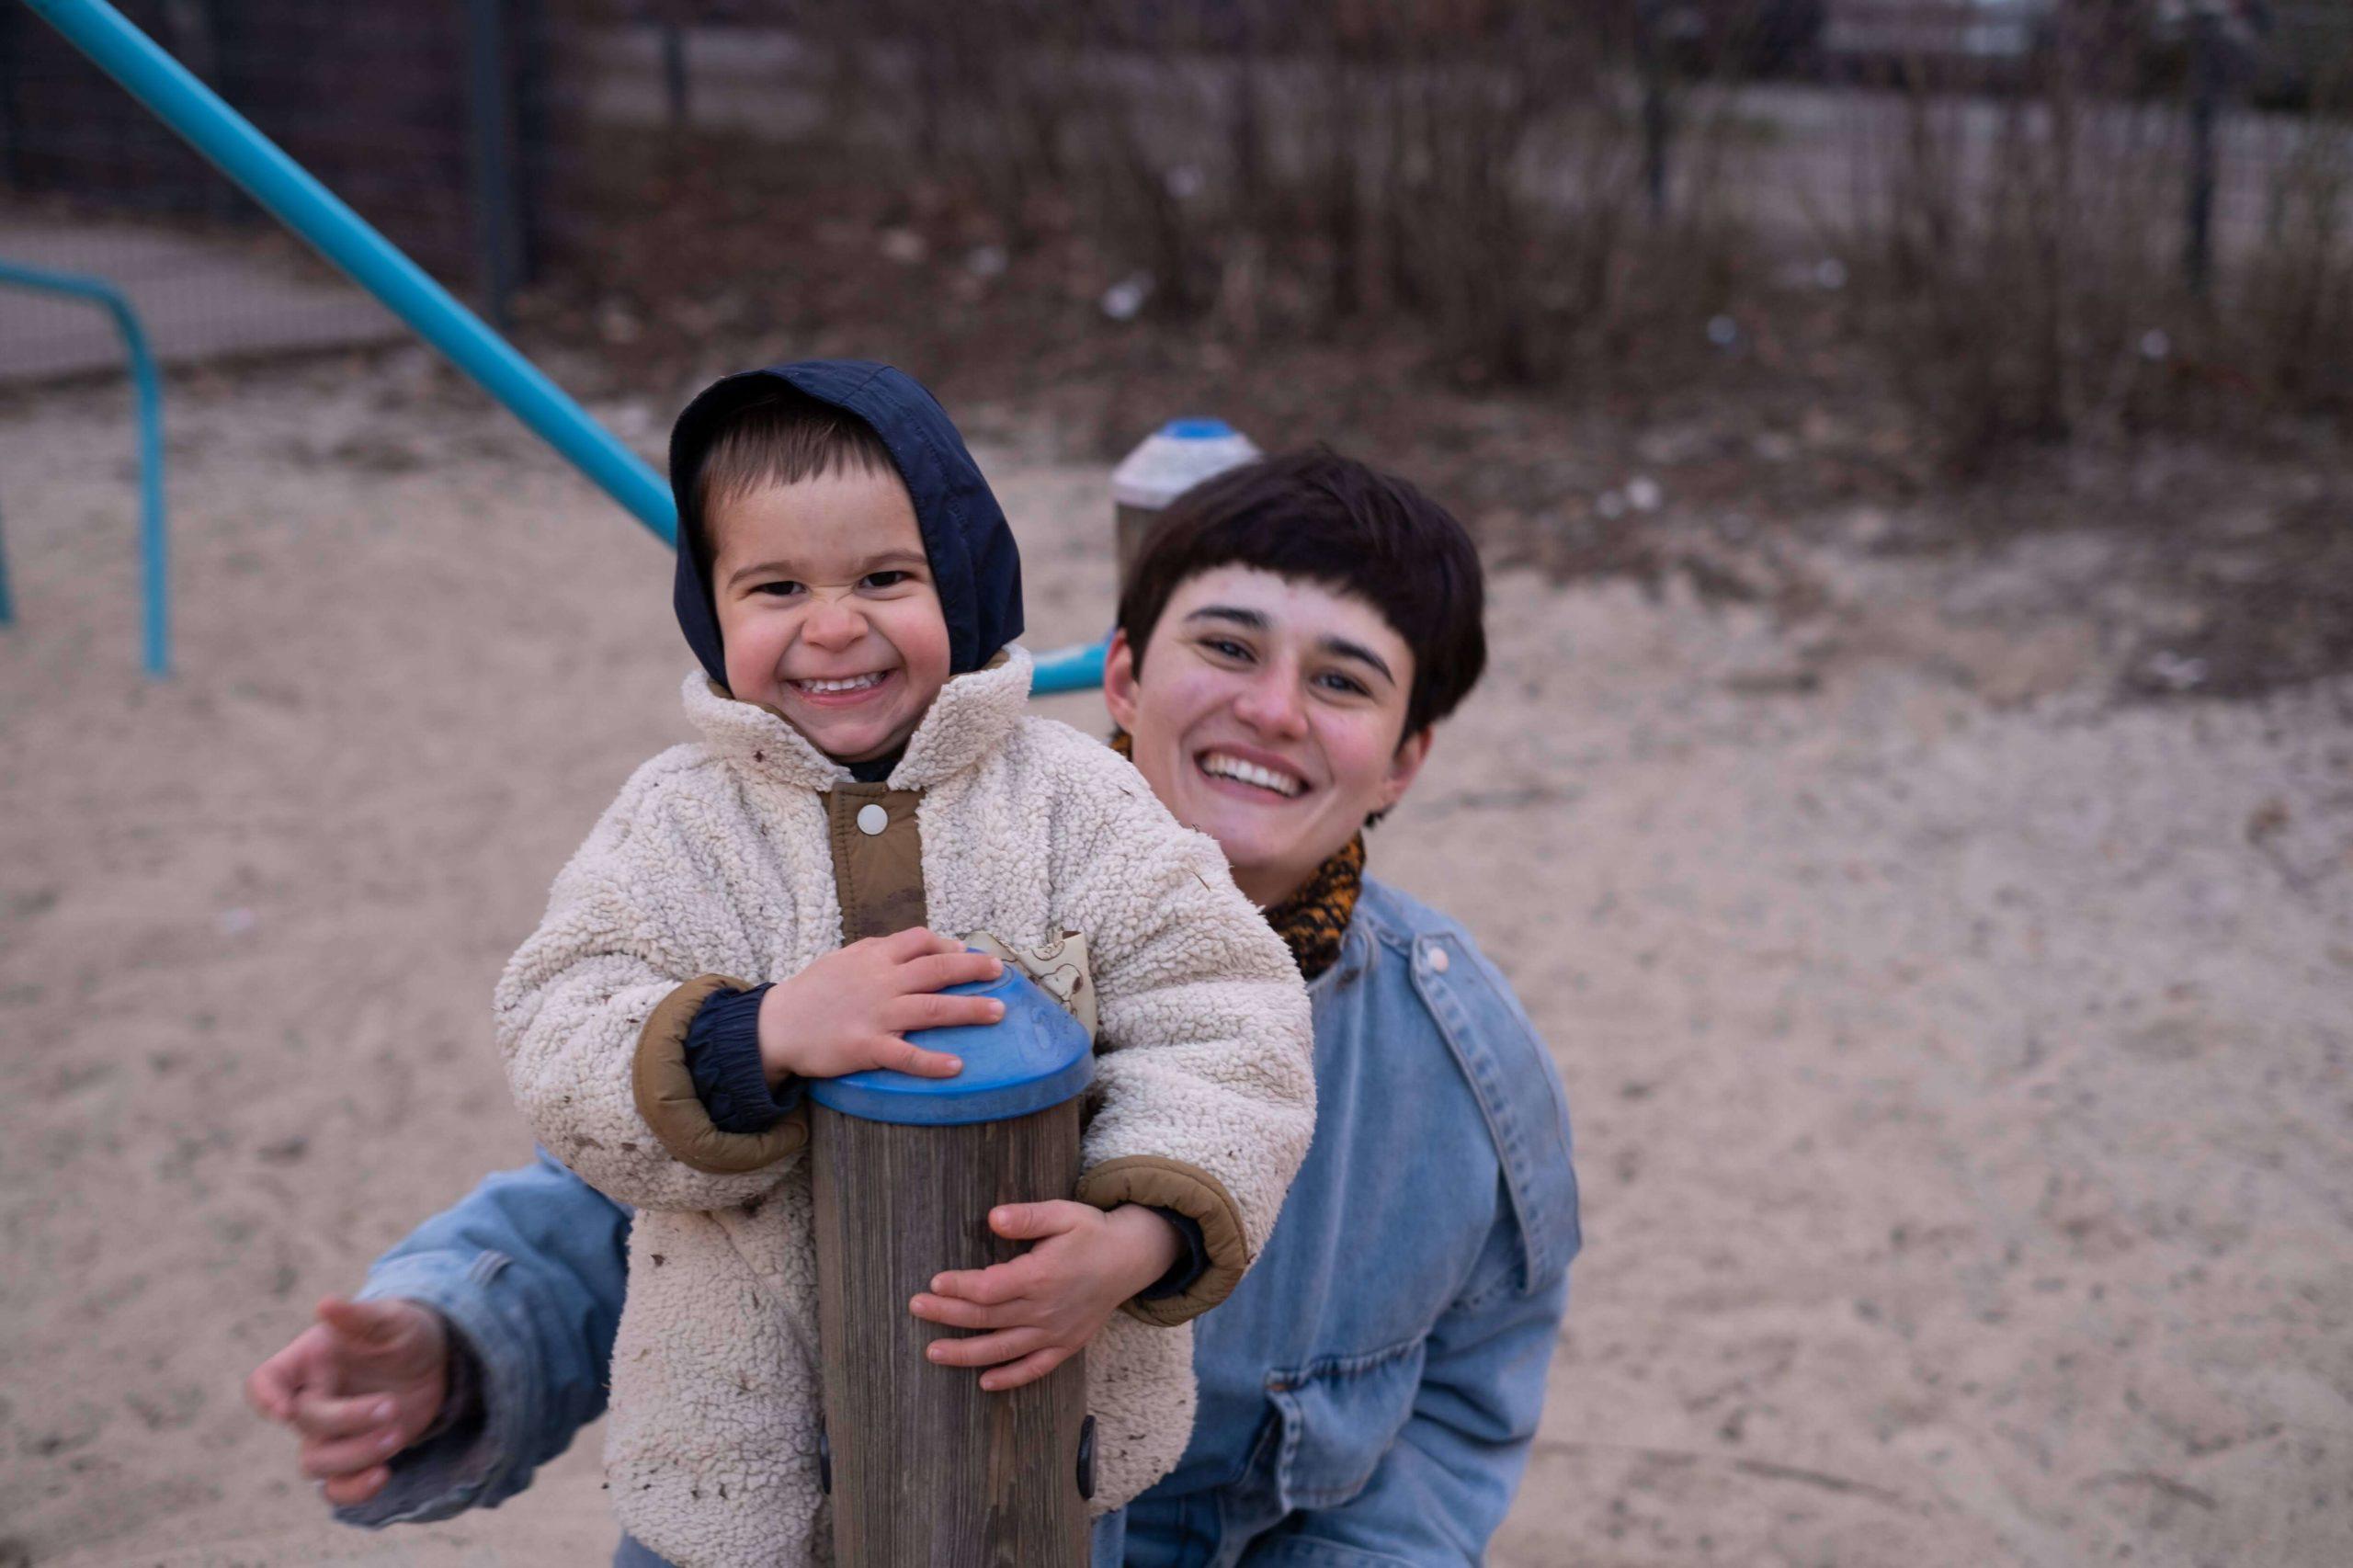 Carolina and her son Otto